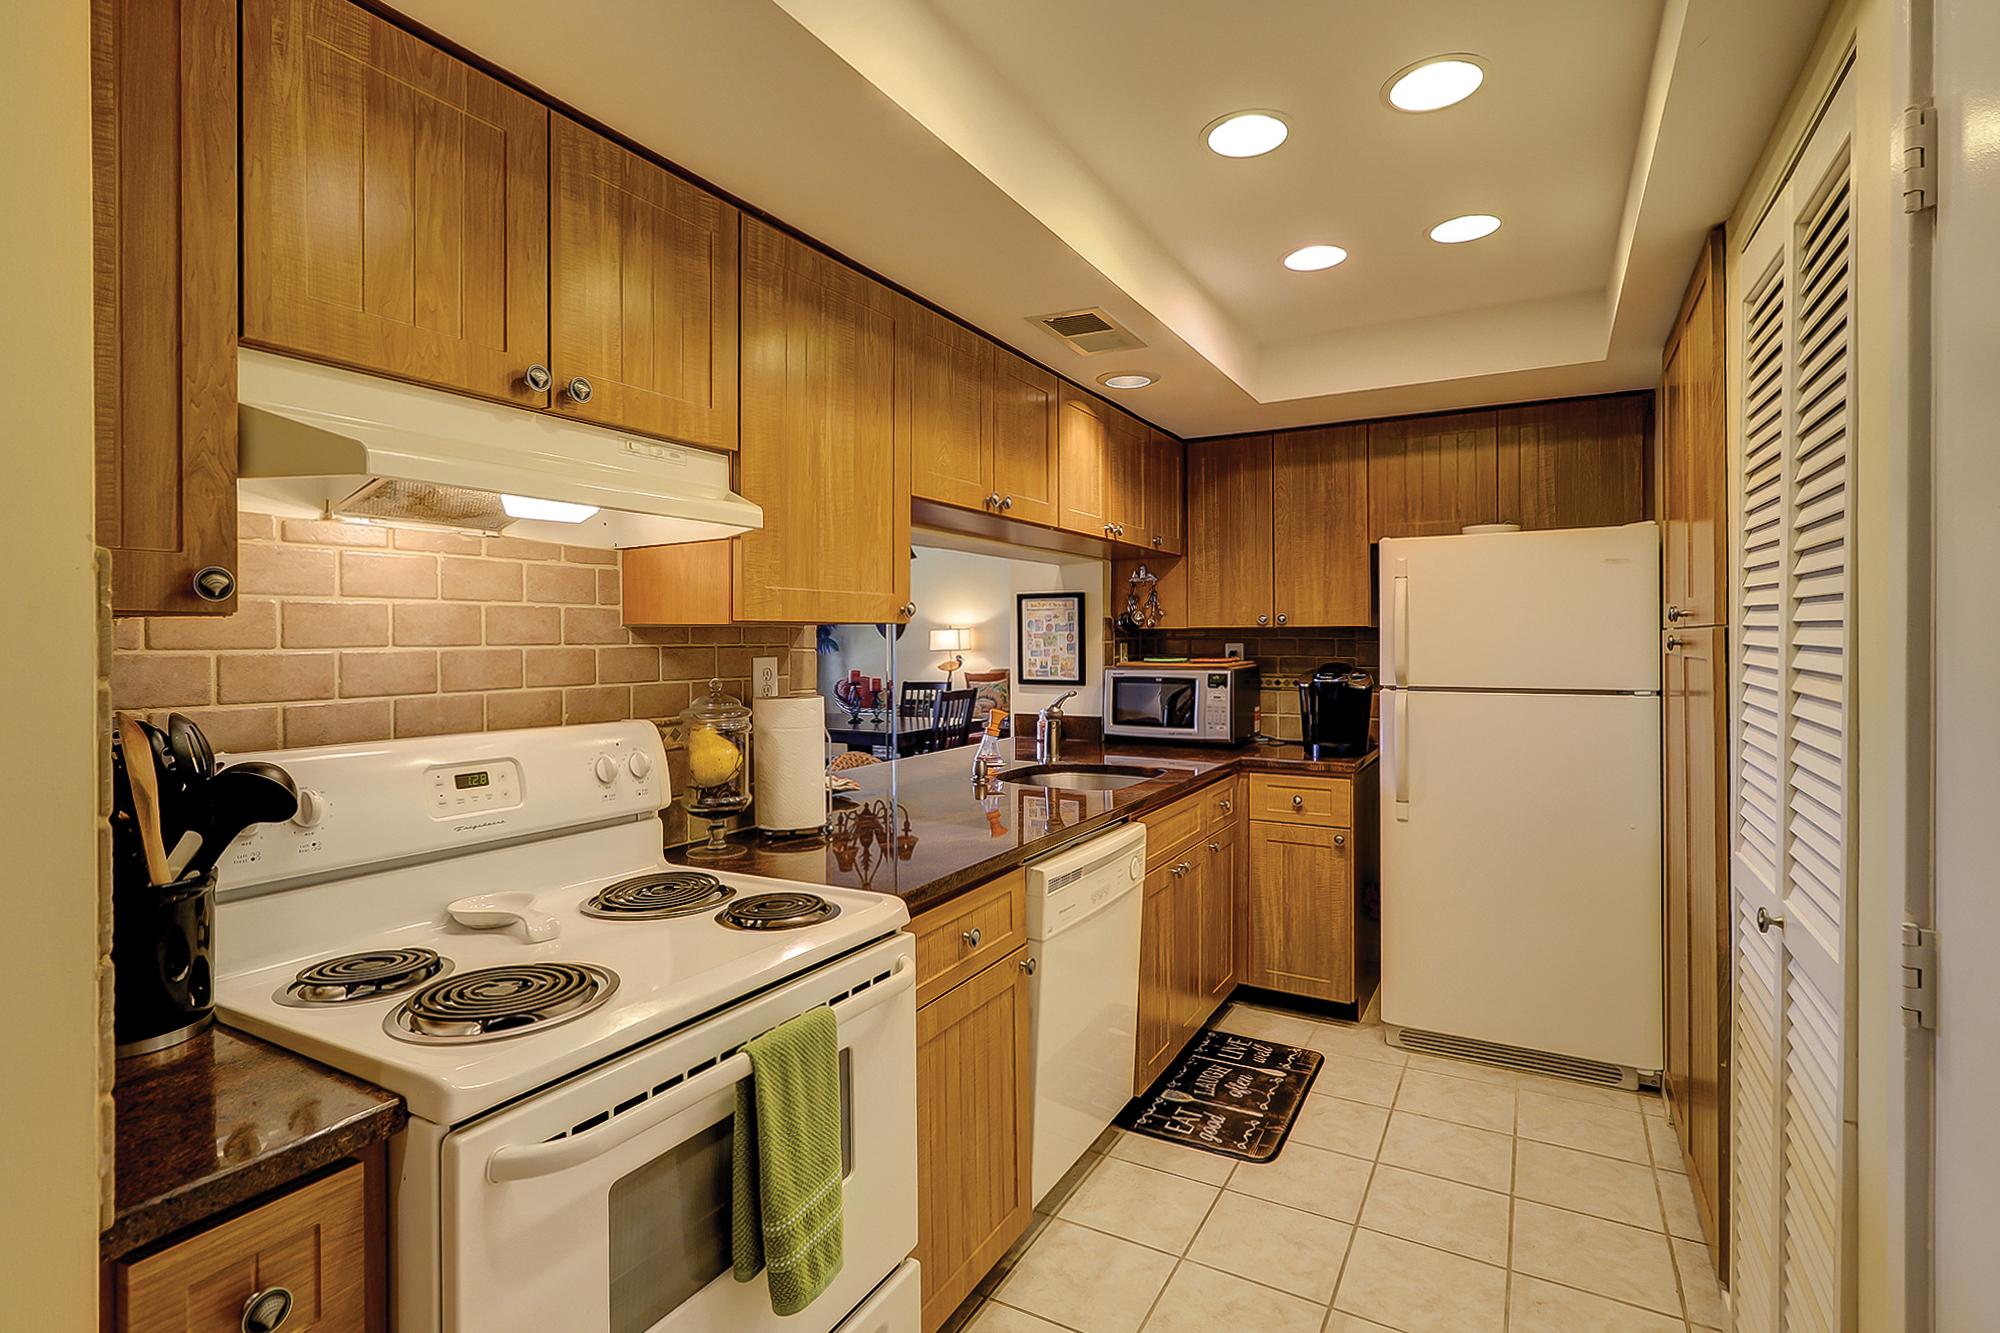 Hilton Villa For Sale with Granite Counter Tops in Shelter Cove